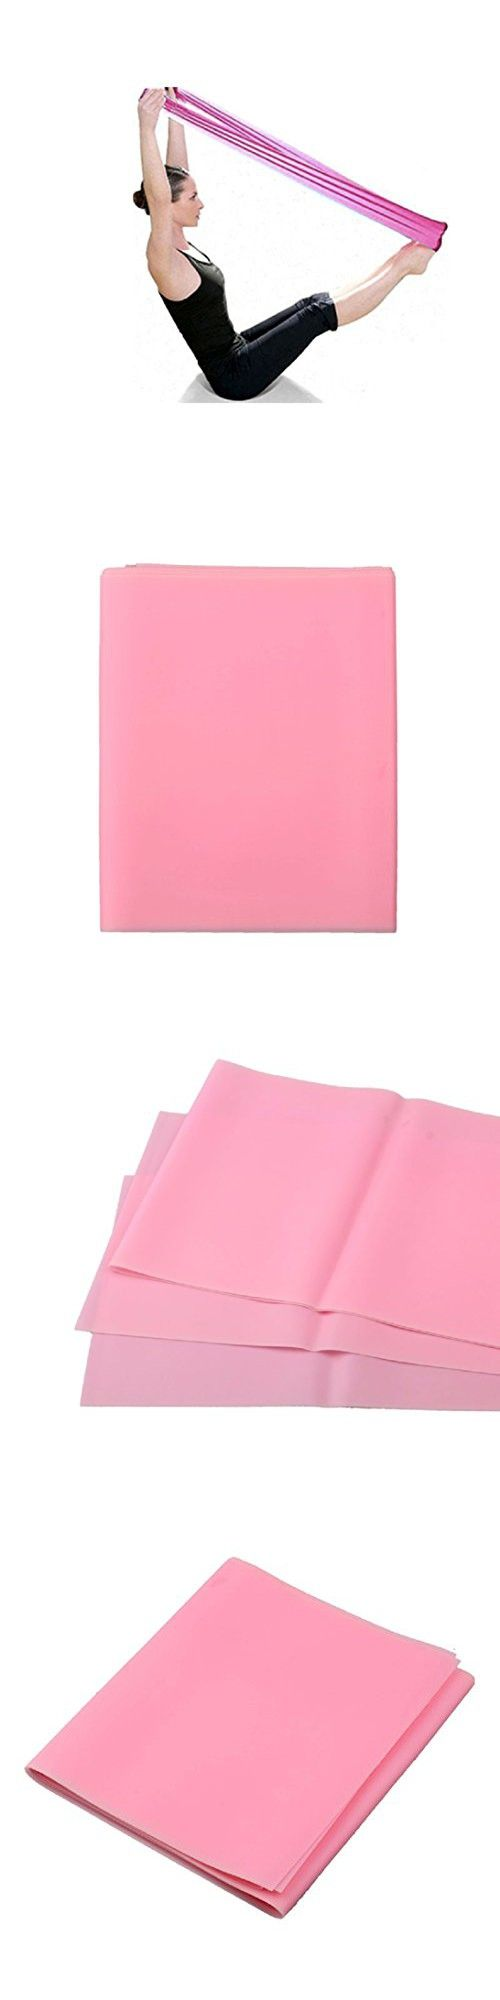 Sunward New Multi-grip Stretch Pilates Yoga Workout Aerobics Stretch Band Strap Belt Tensile Adjustable Elastic Band (Pink)